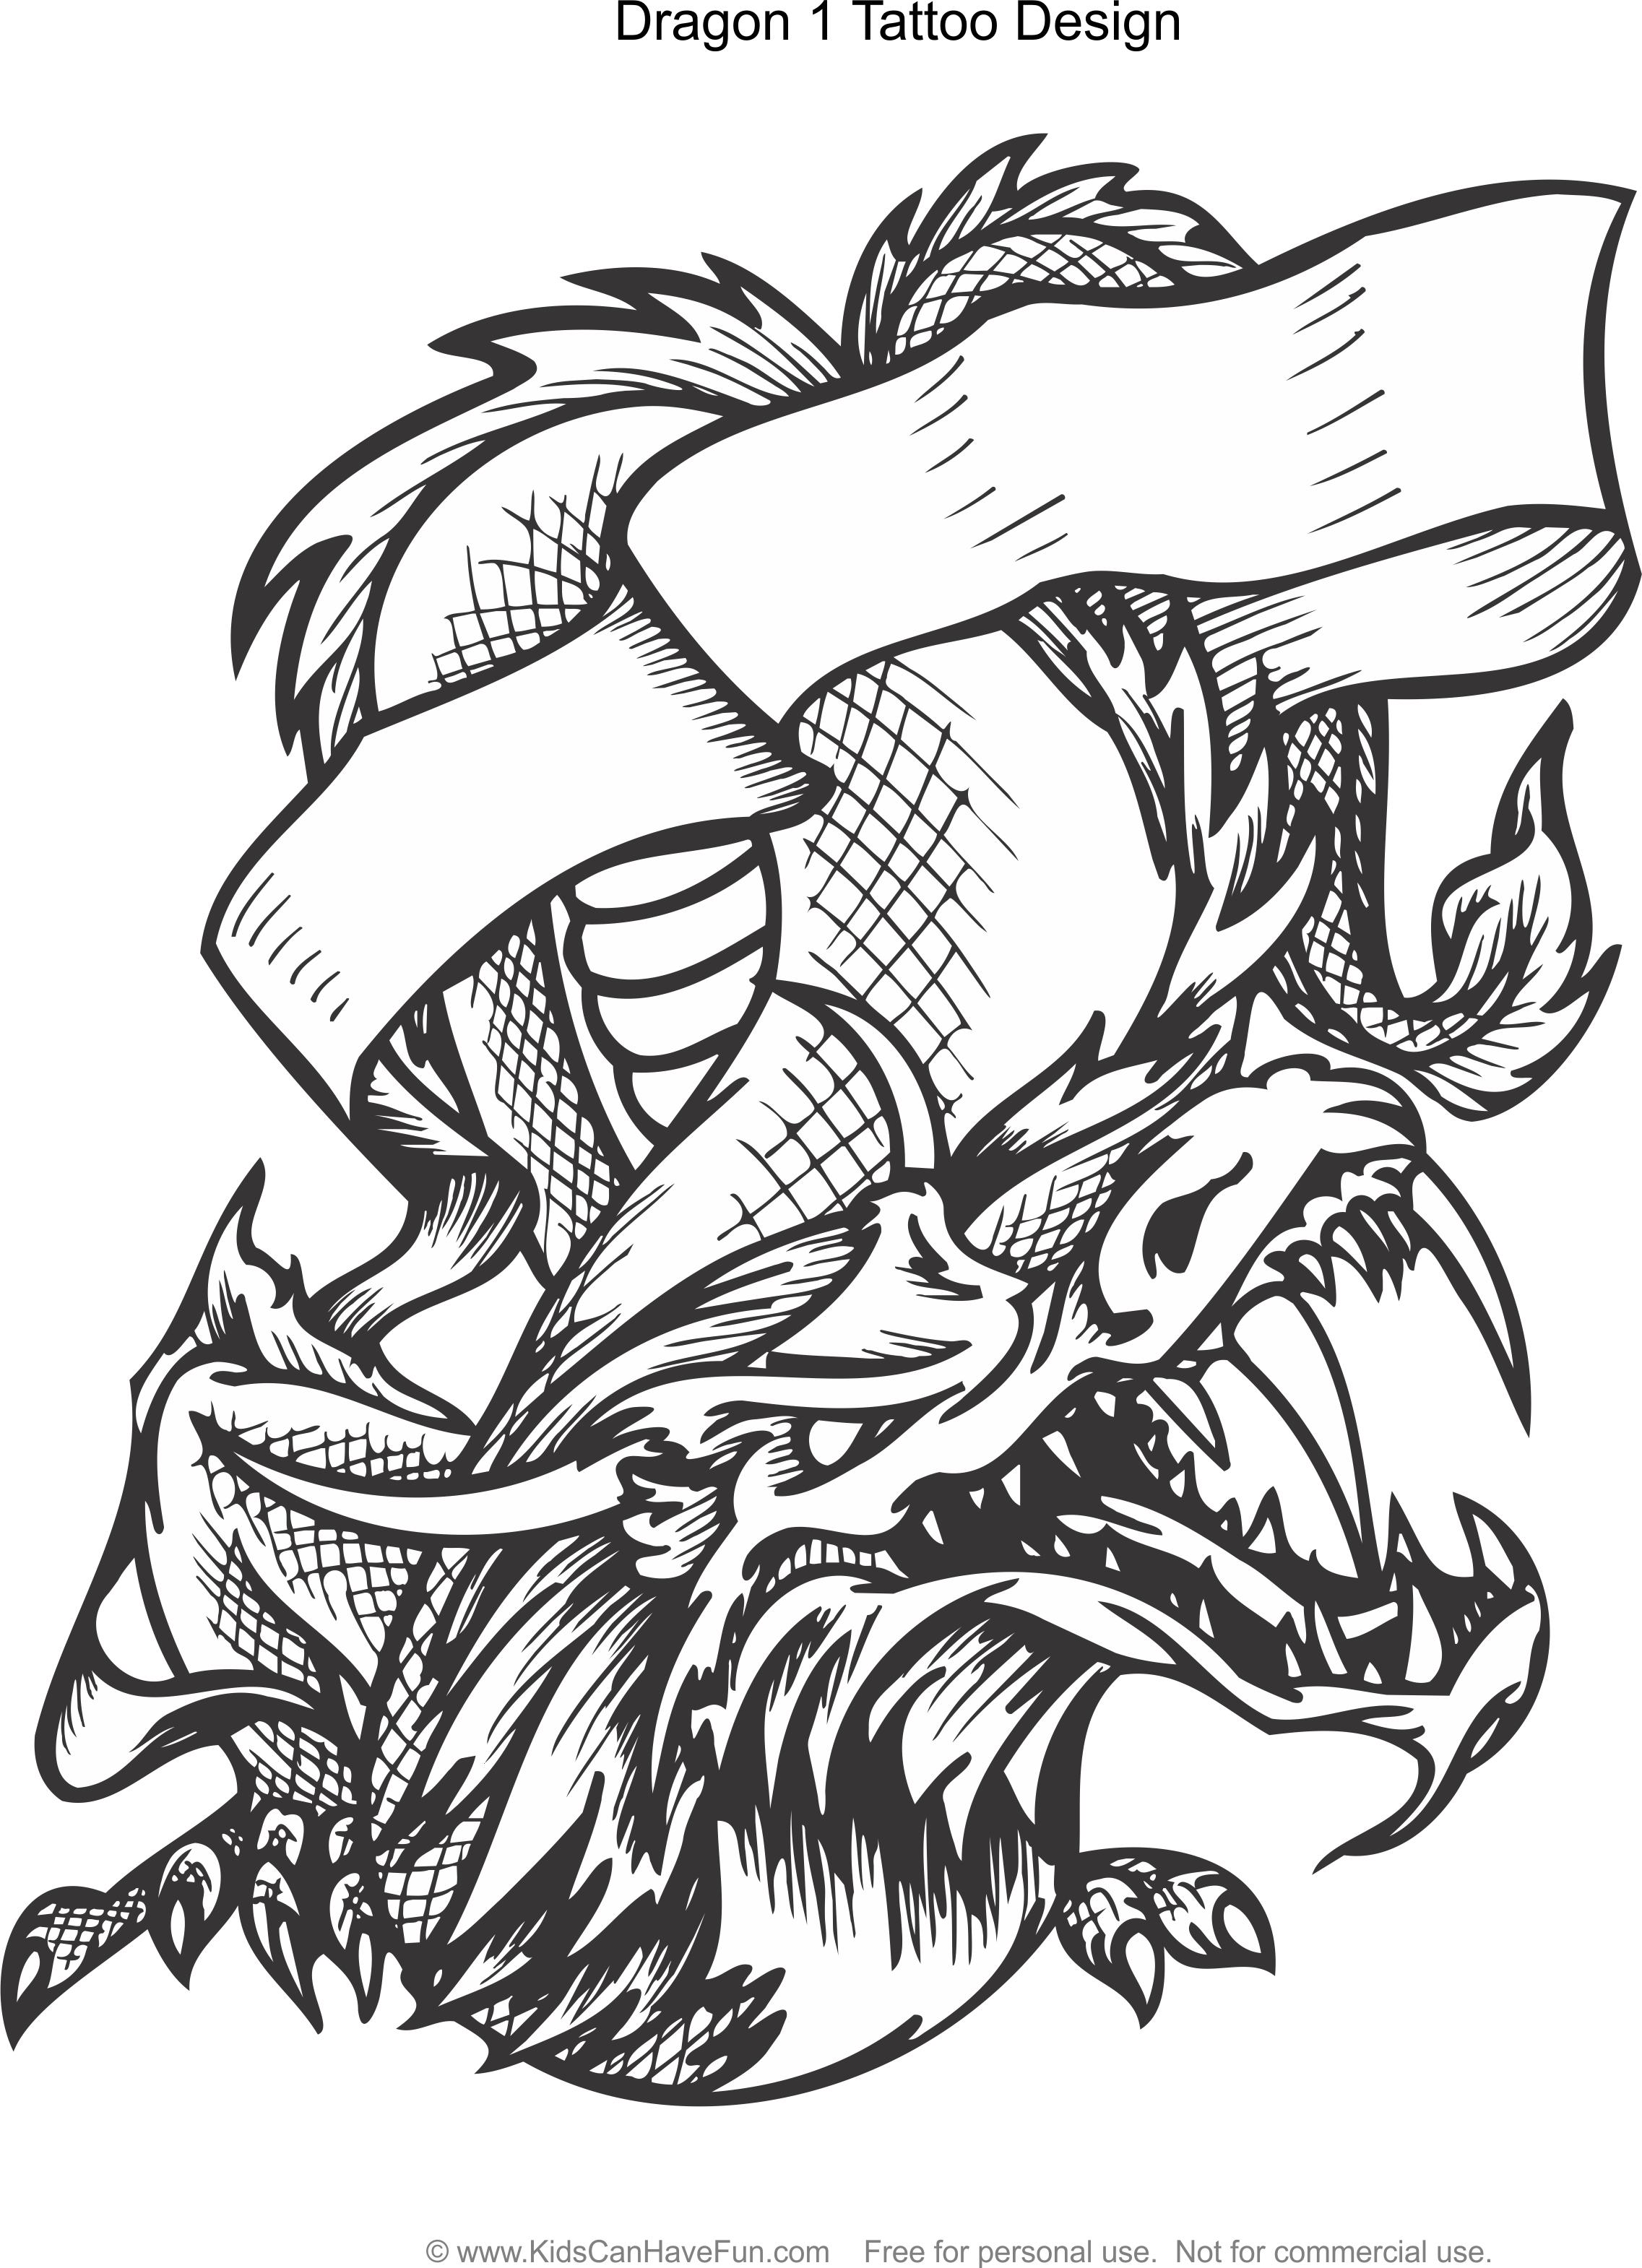 Tattoo designs coloring book - Dragon 1 Tattoo Design Coloring Page Http Www Kidscanhavefun Com